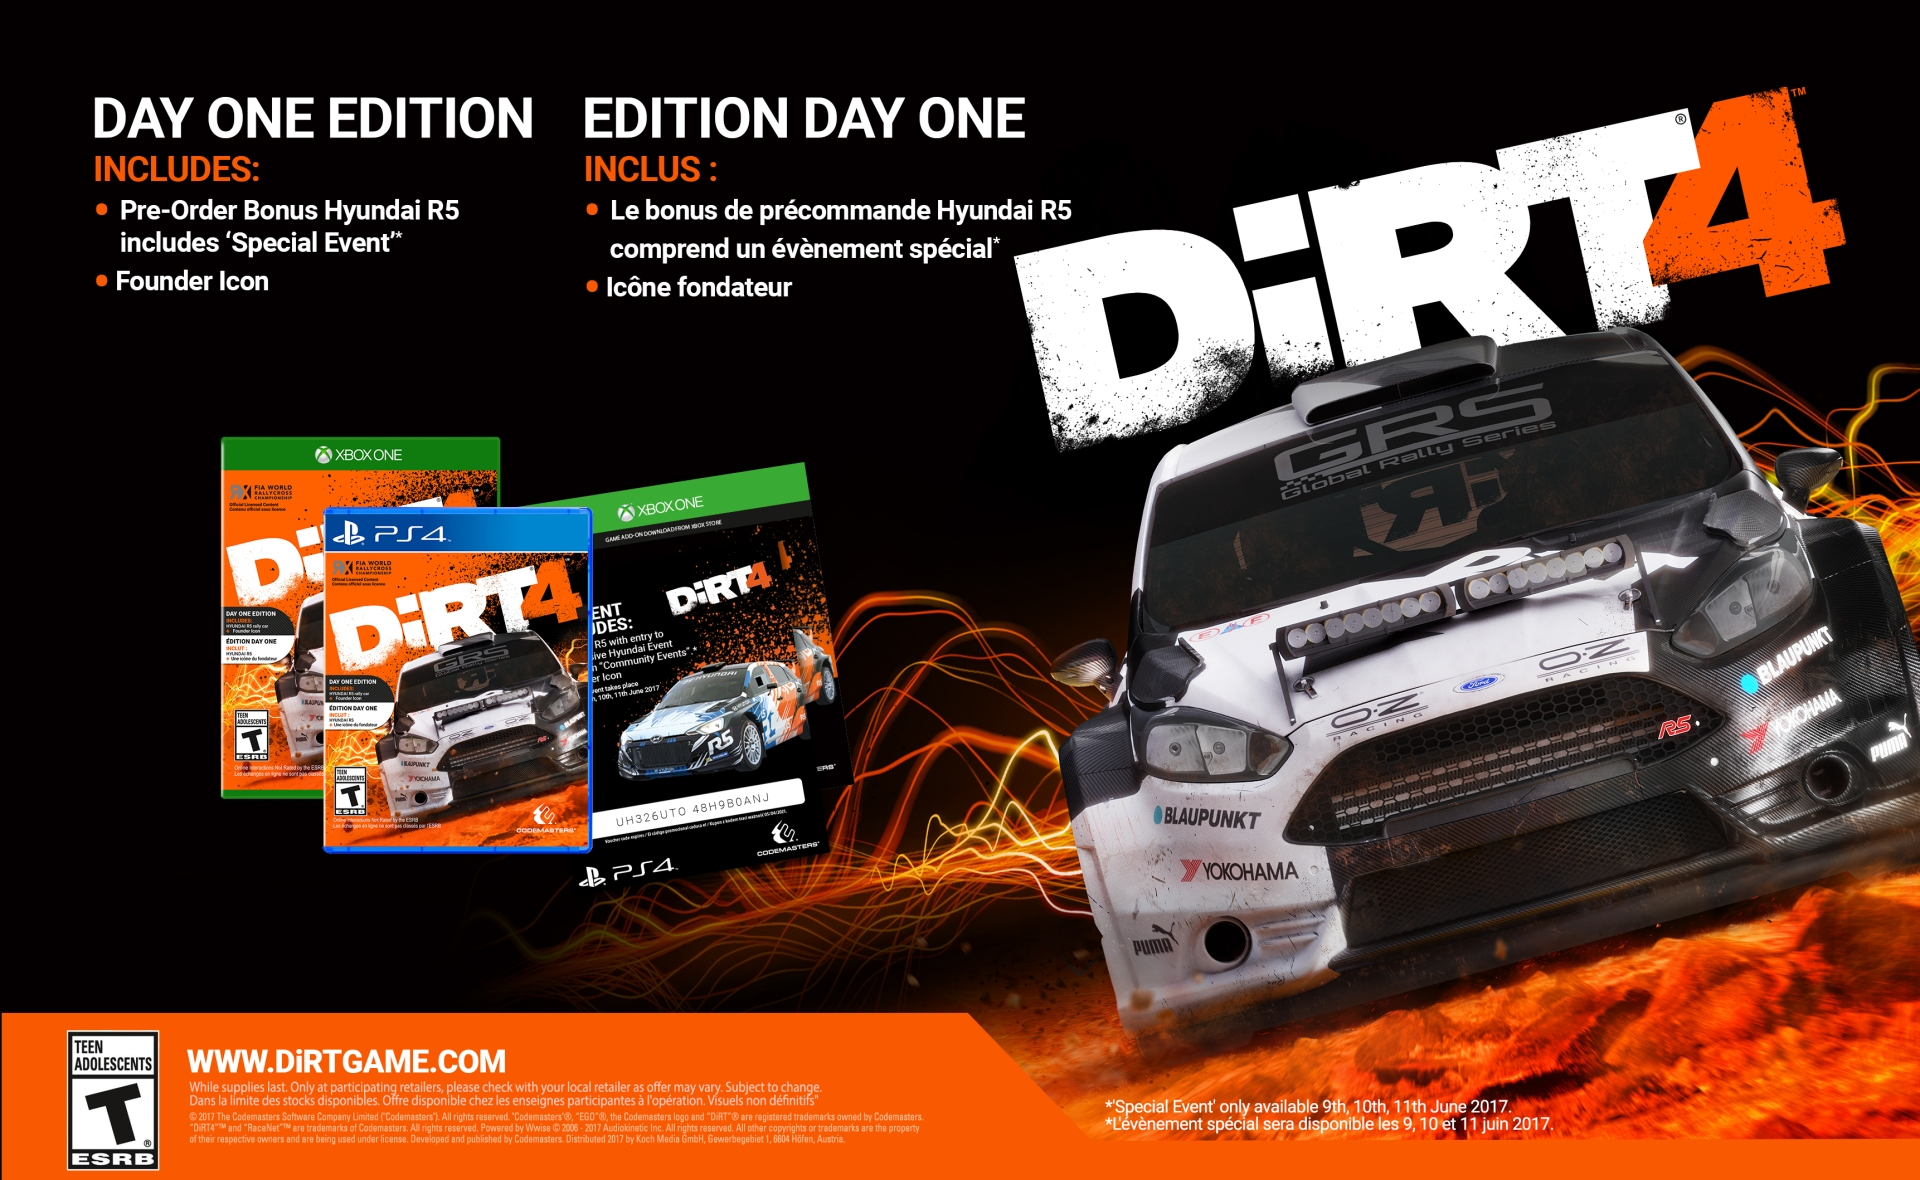 Dirt 4 Review – Όλα όσα πρέπει να ξέρετε για το καλύτερο Racing Game